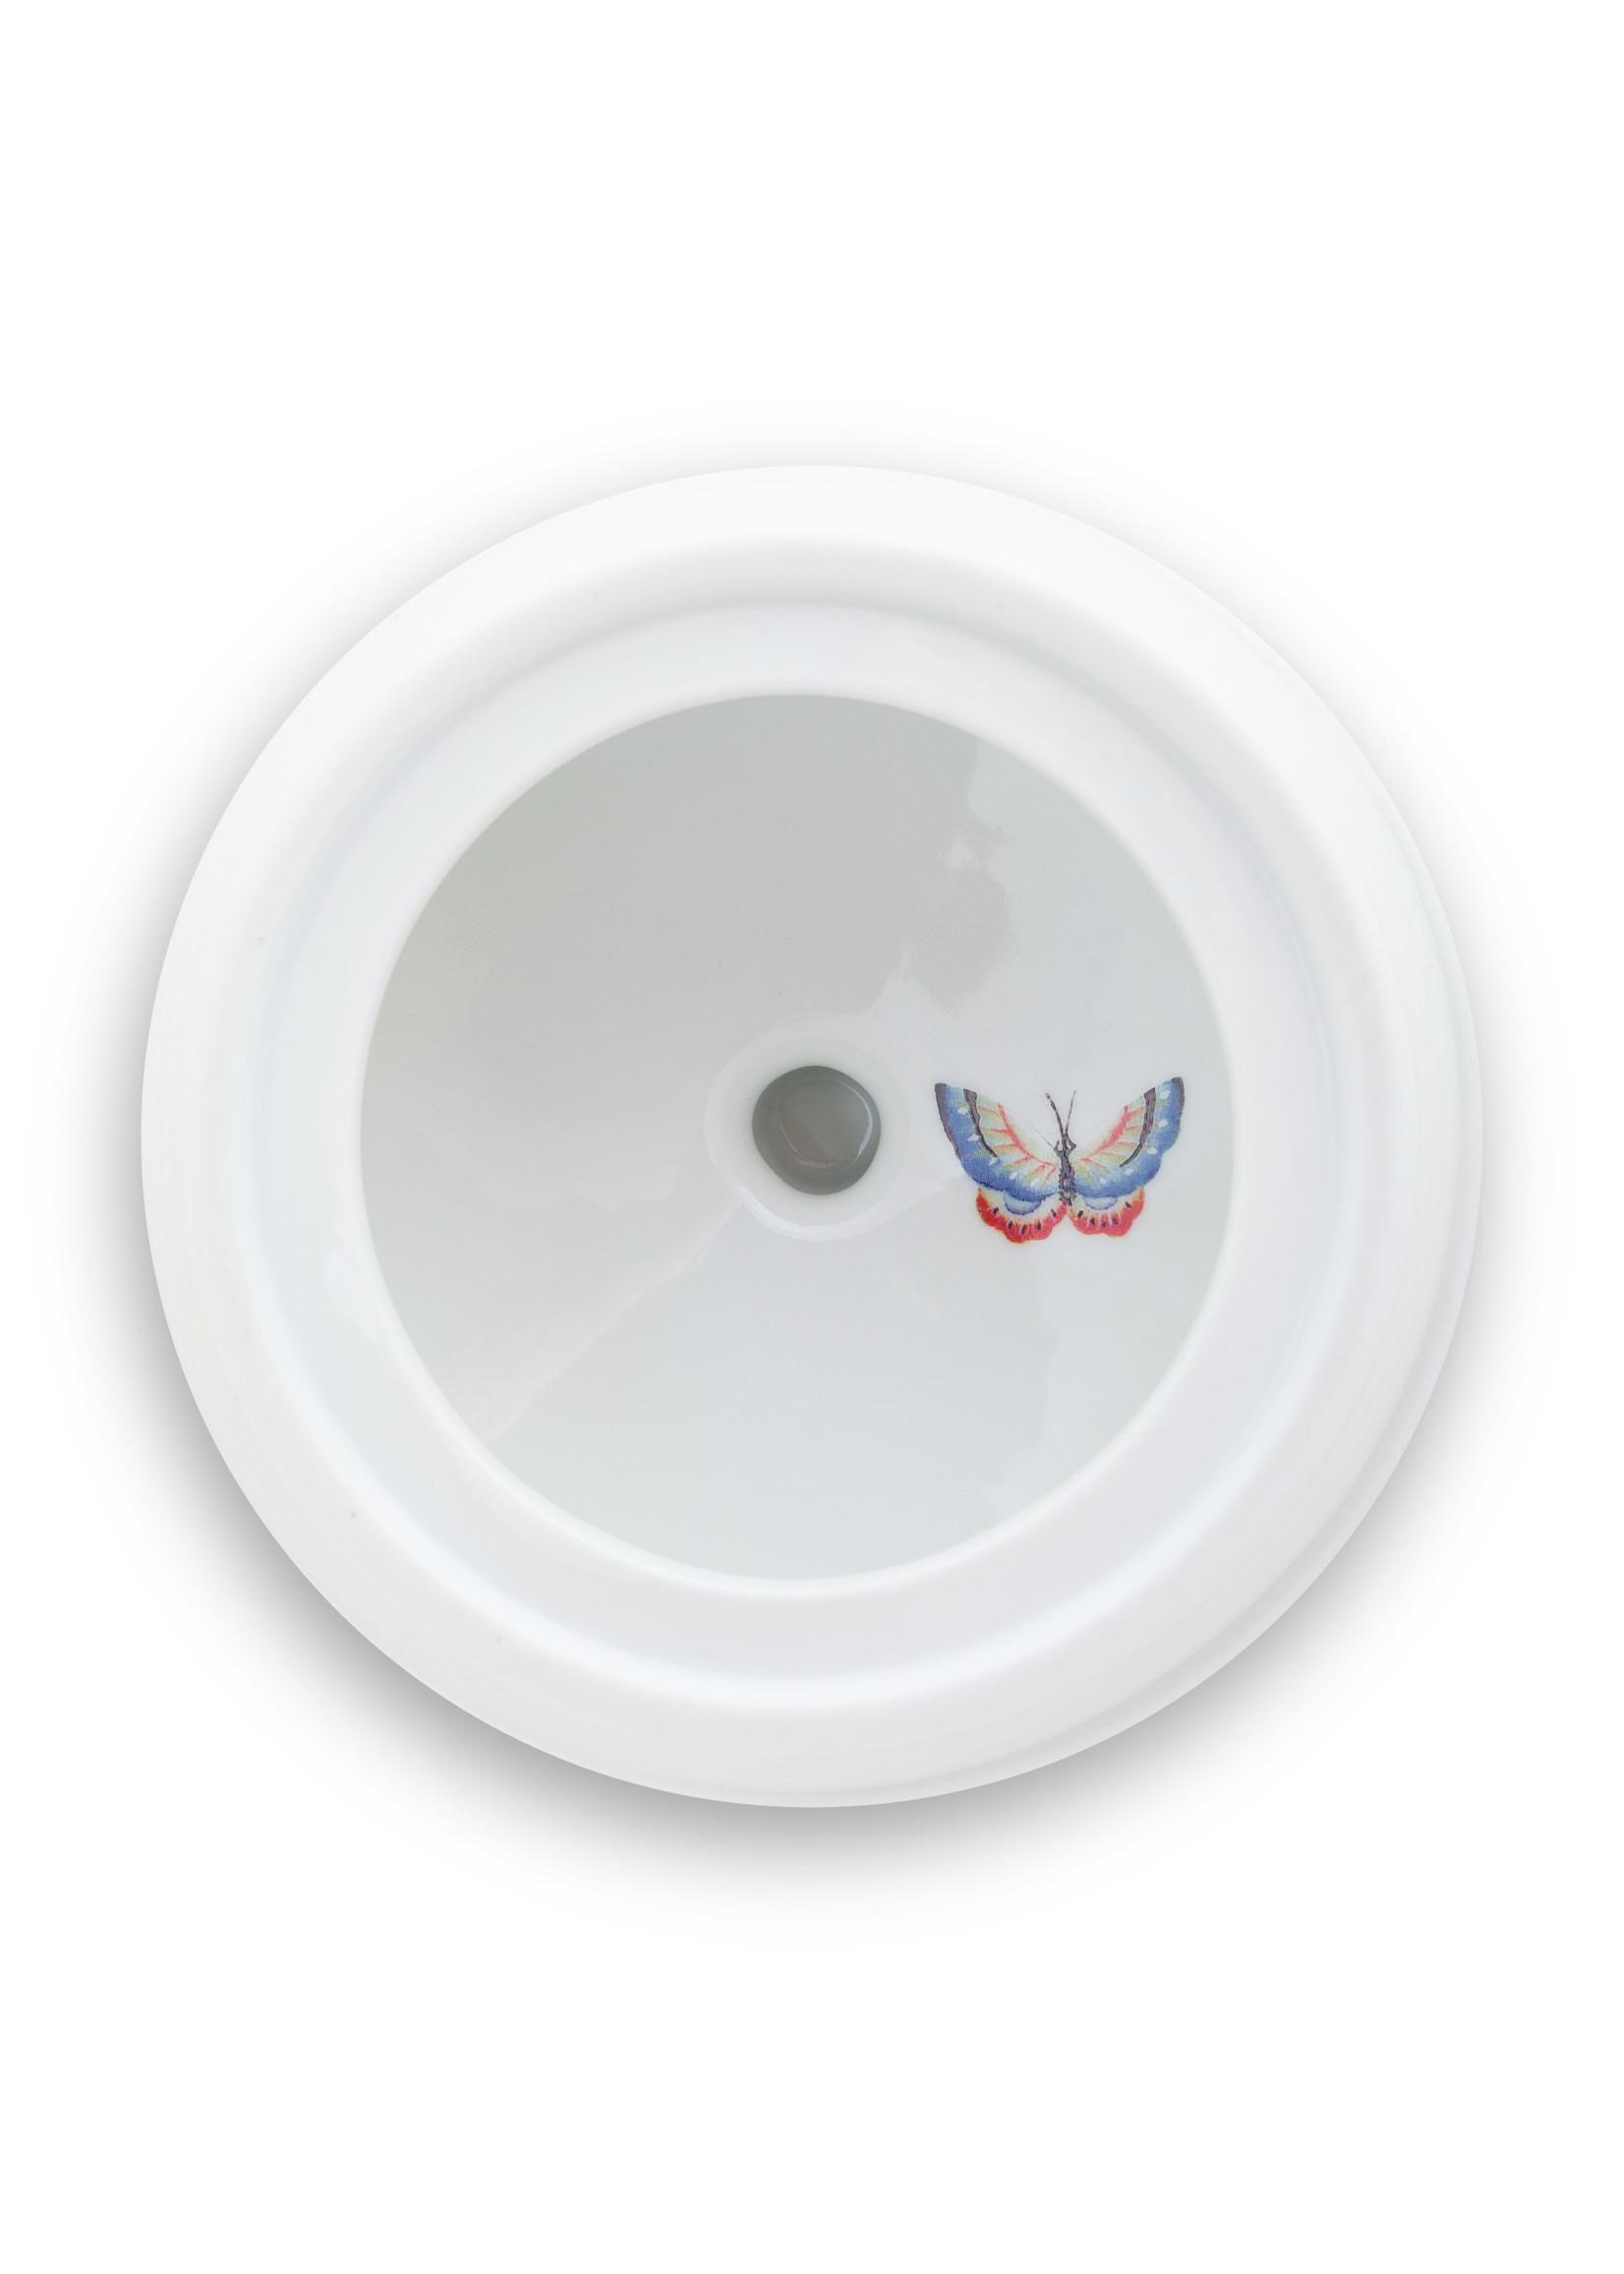 pip studio Storage Jar Blushing Birds White 1.5ltr